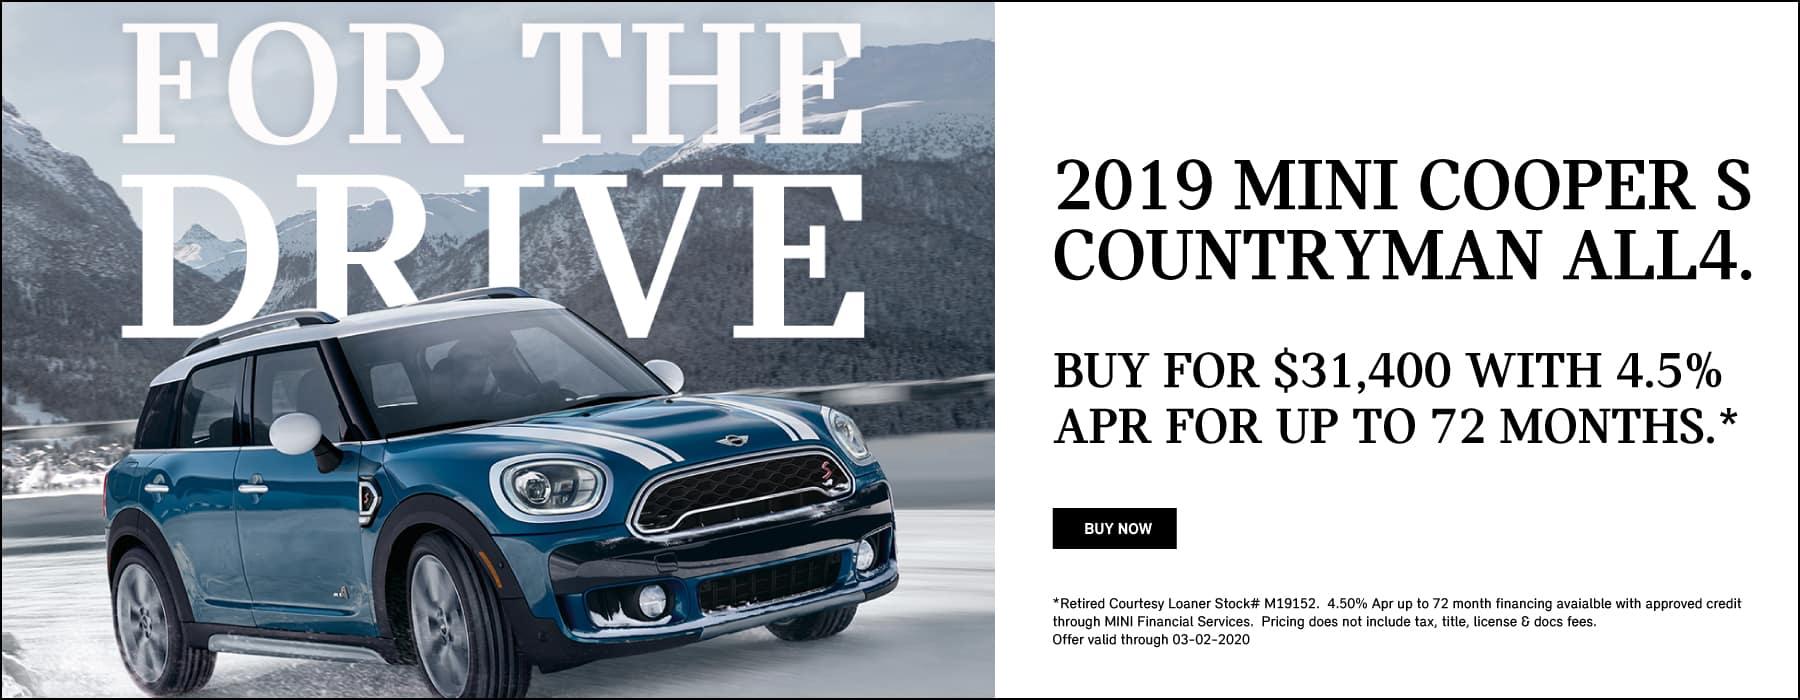 2019 MINI Cooper S Countryman ALL4 Signature Premium Buy for $31,400 savings of $7,215